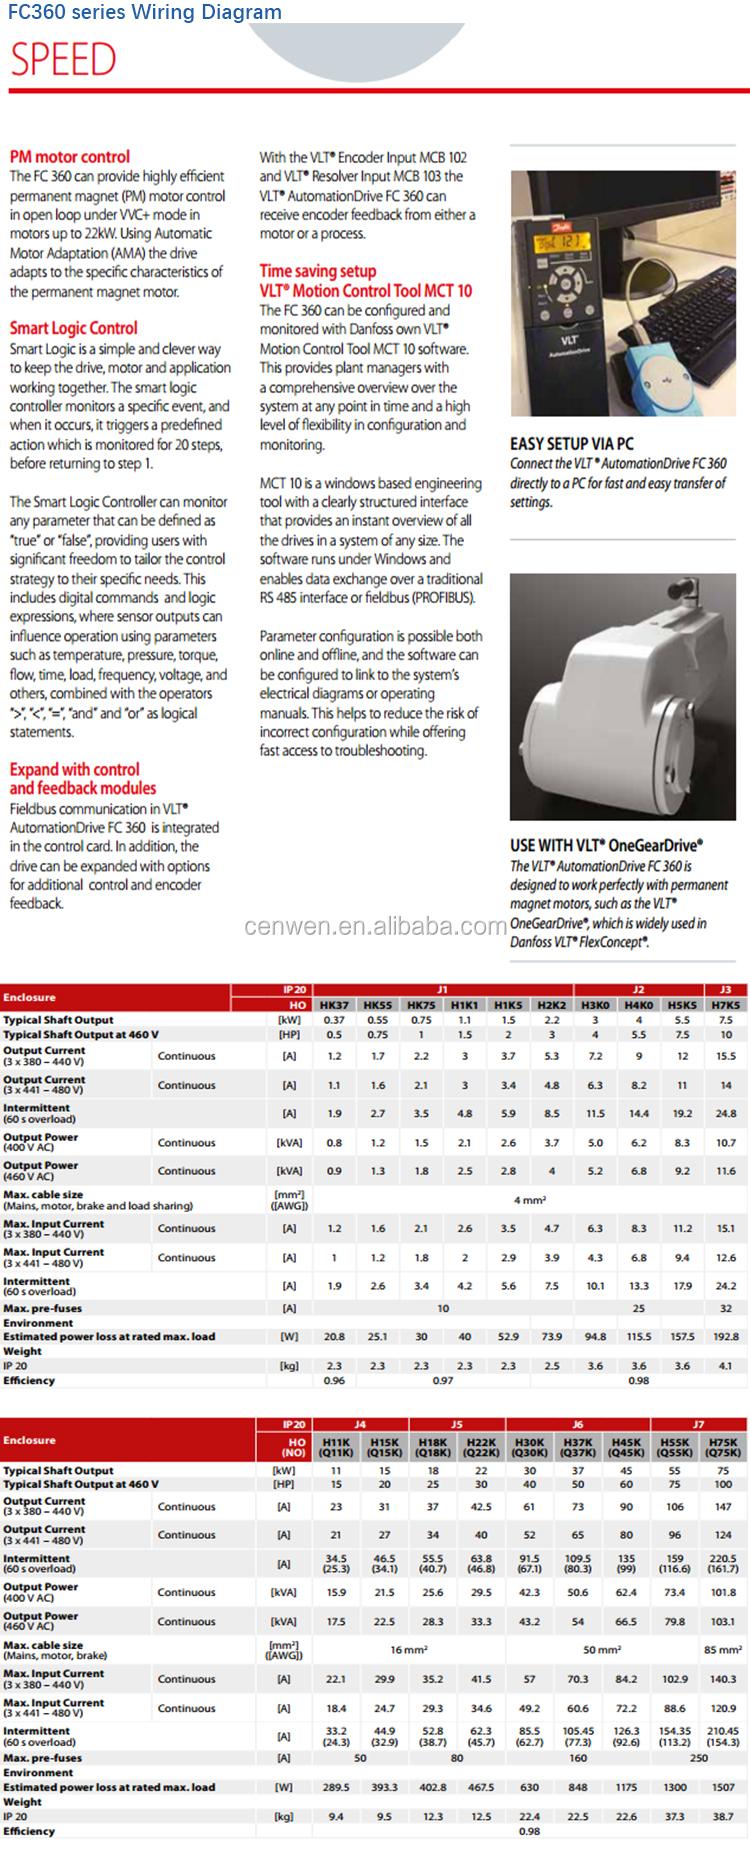 5000w Power Inverter Circuit Diagram - Wiring Diagram General